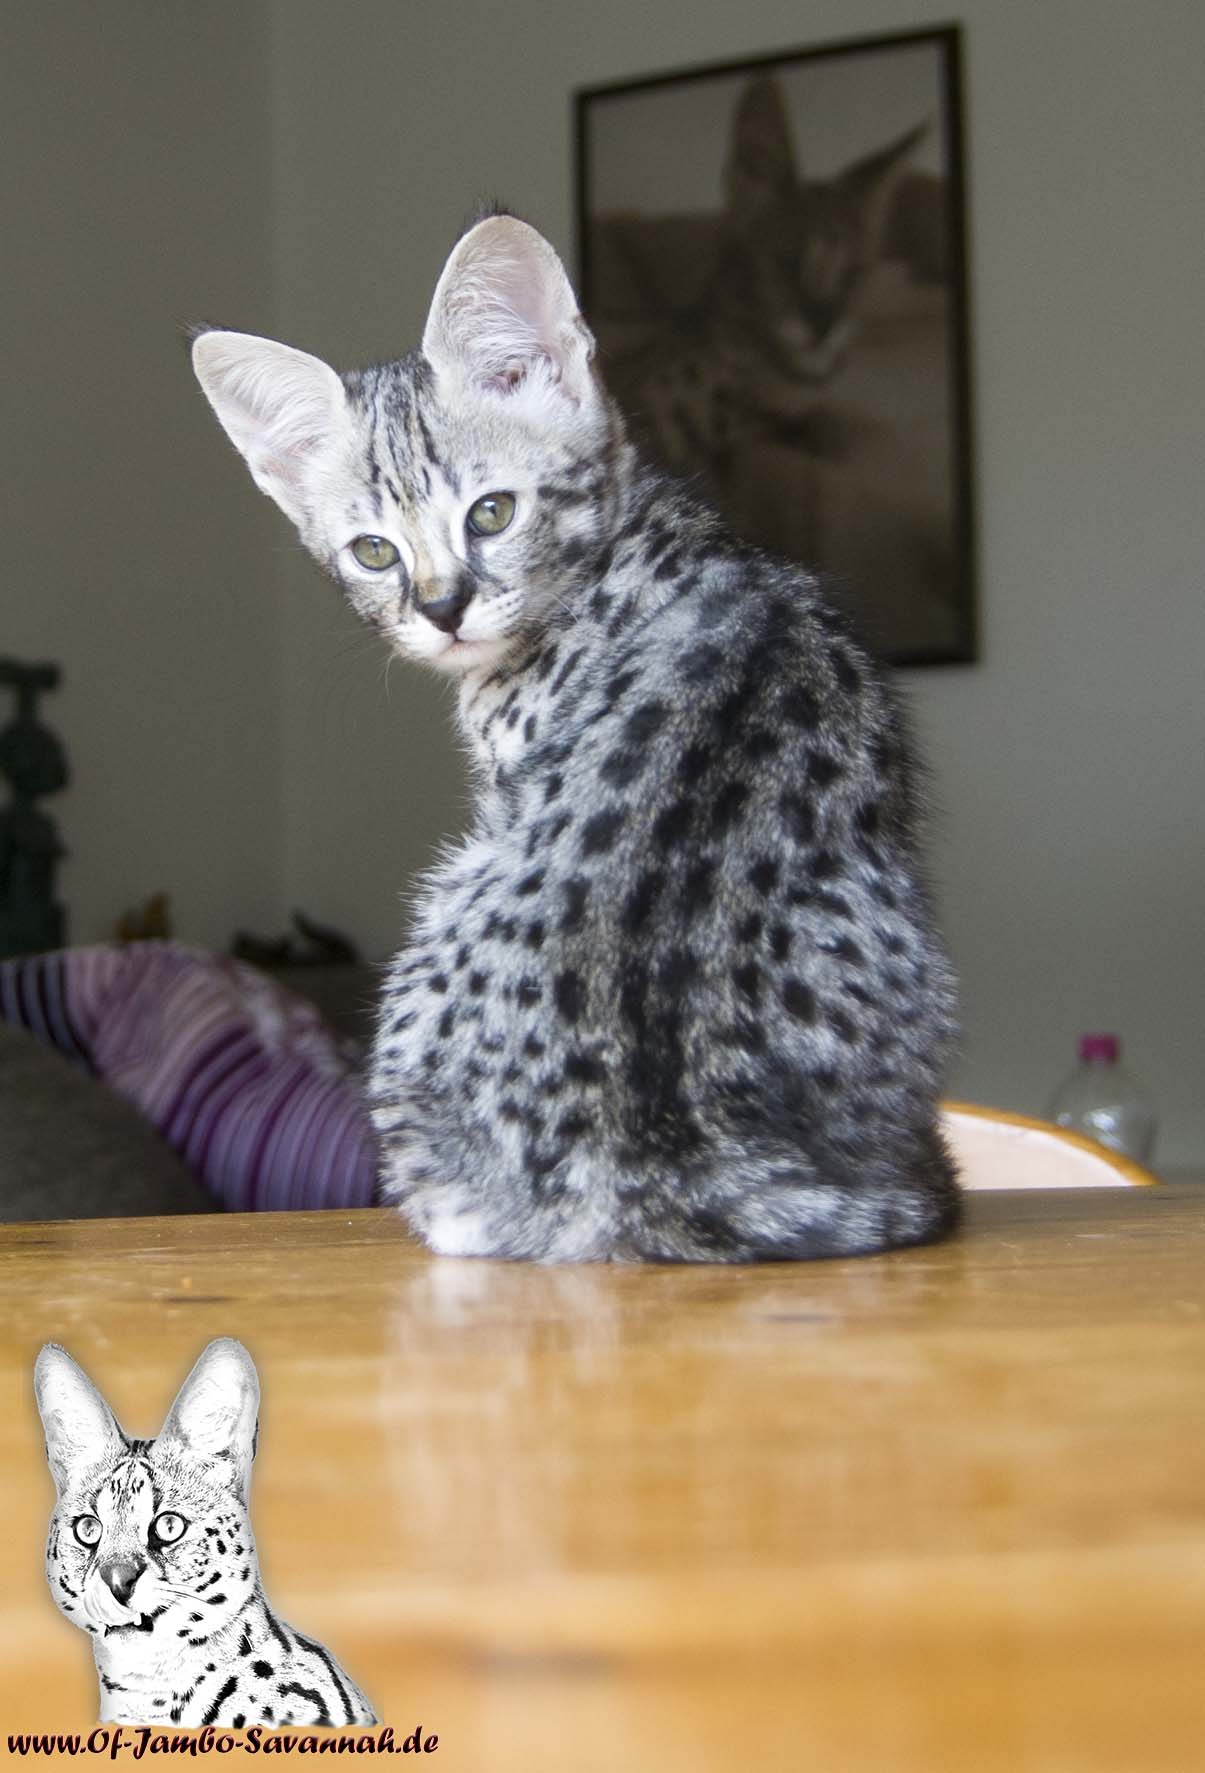 f1 savannah kitten emma of jambo of jambo savannah cats. Black Bedroom Furniture Sets. Home Design Ideas